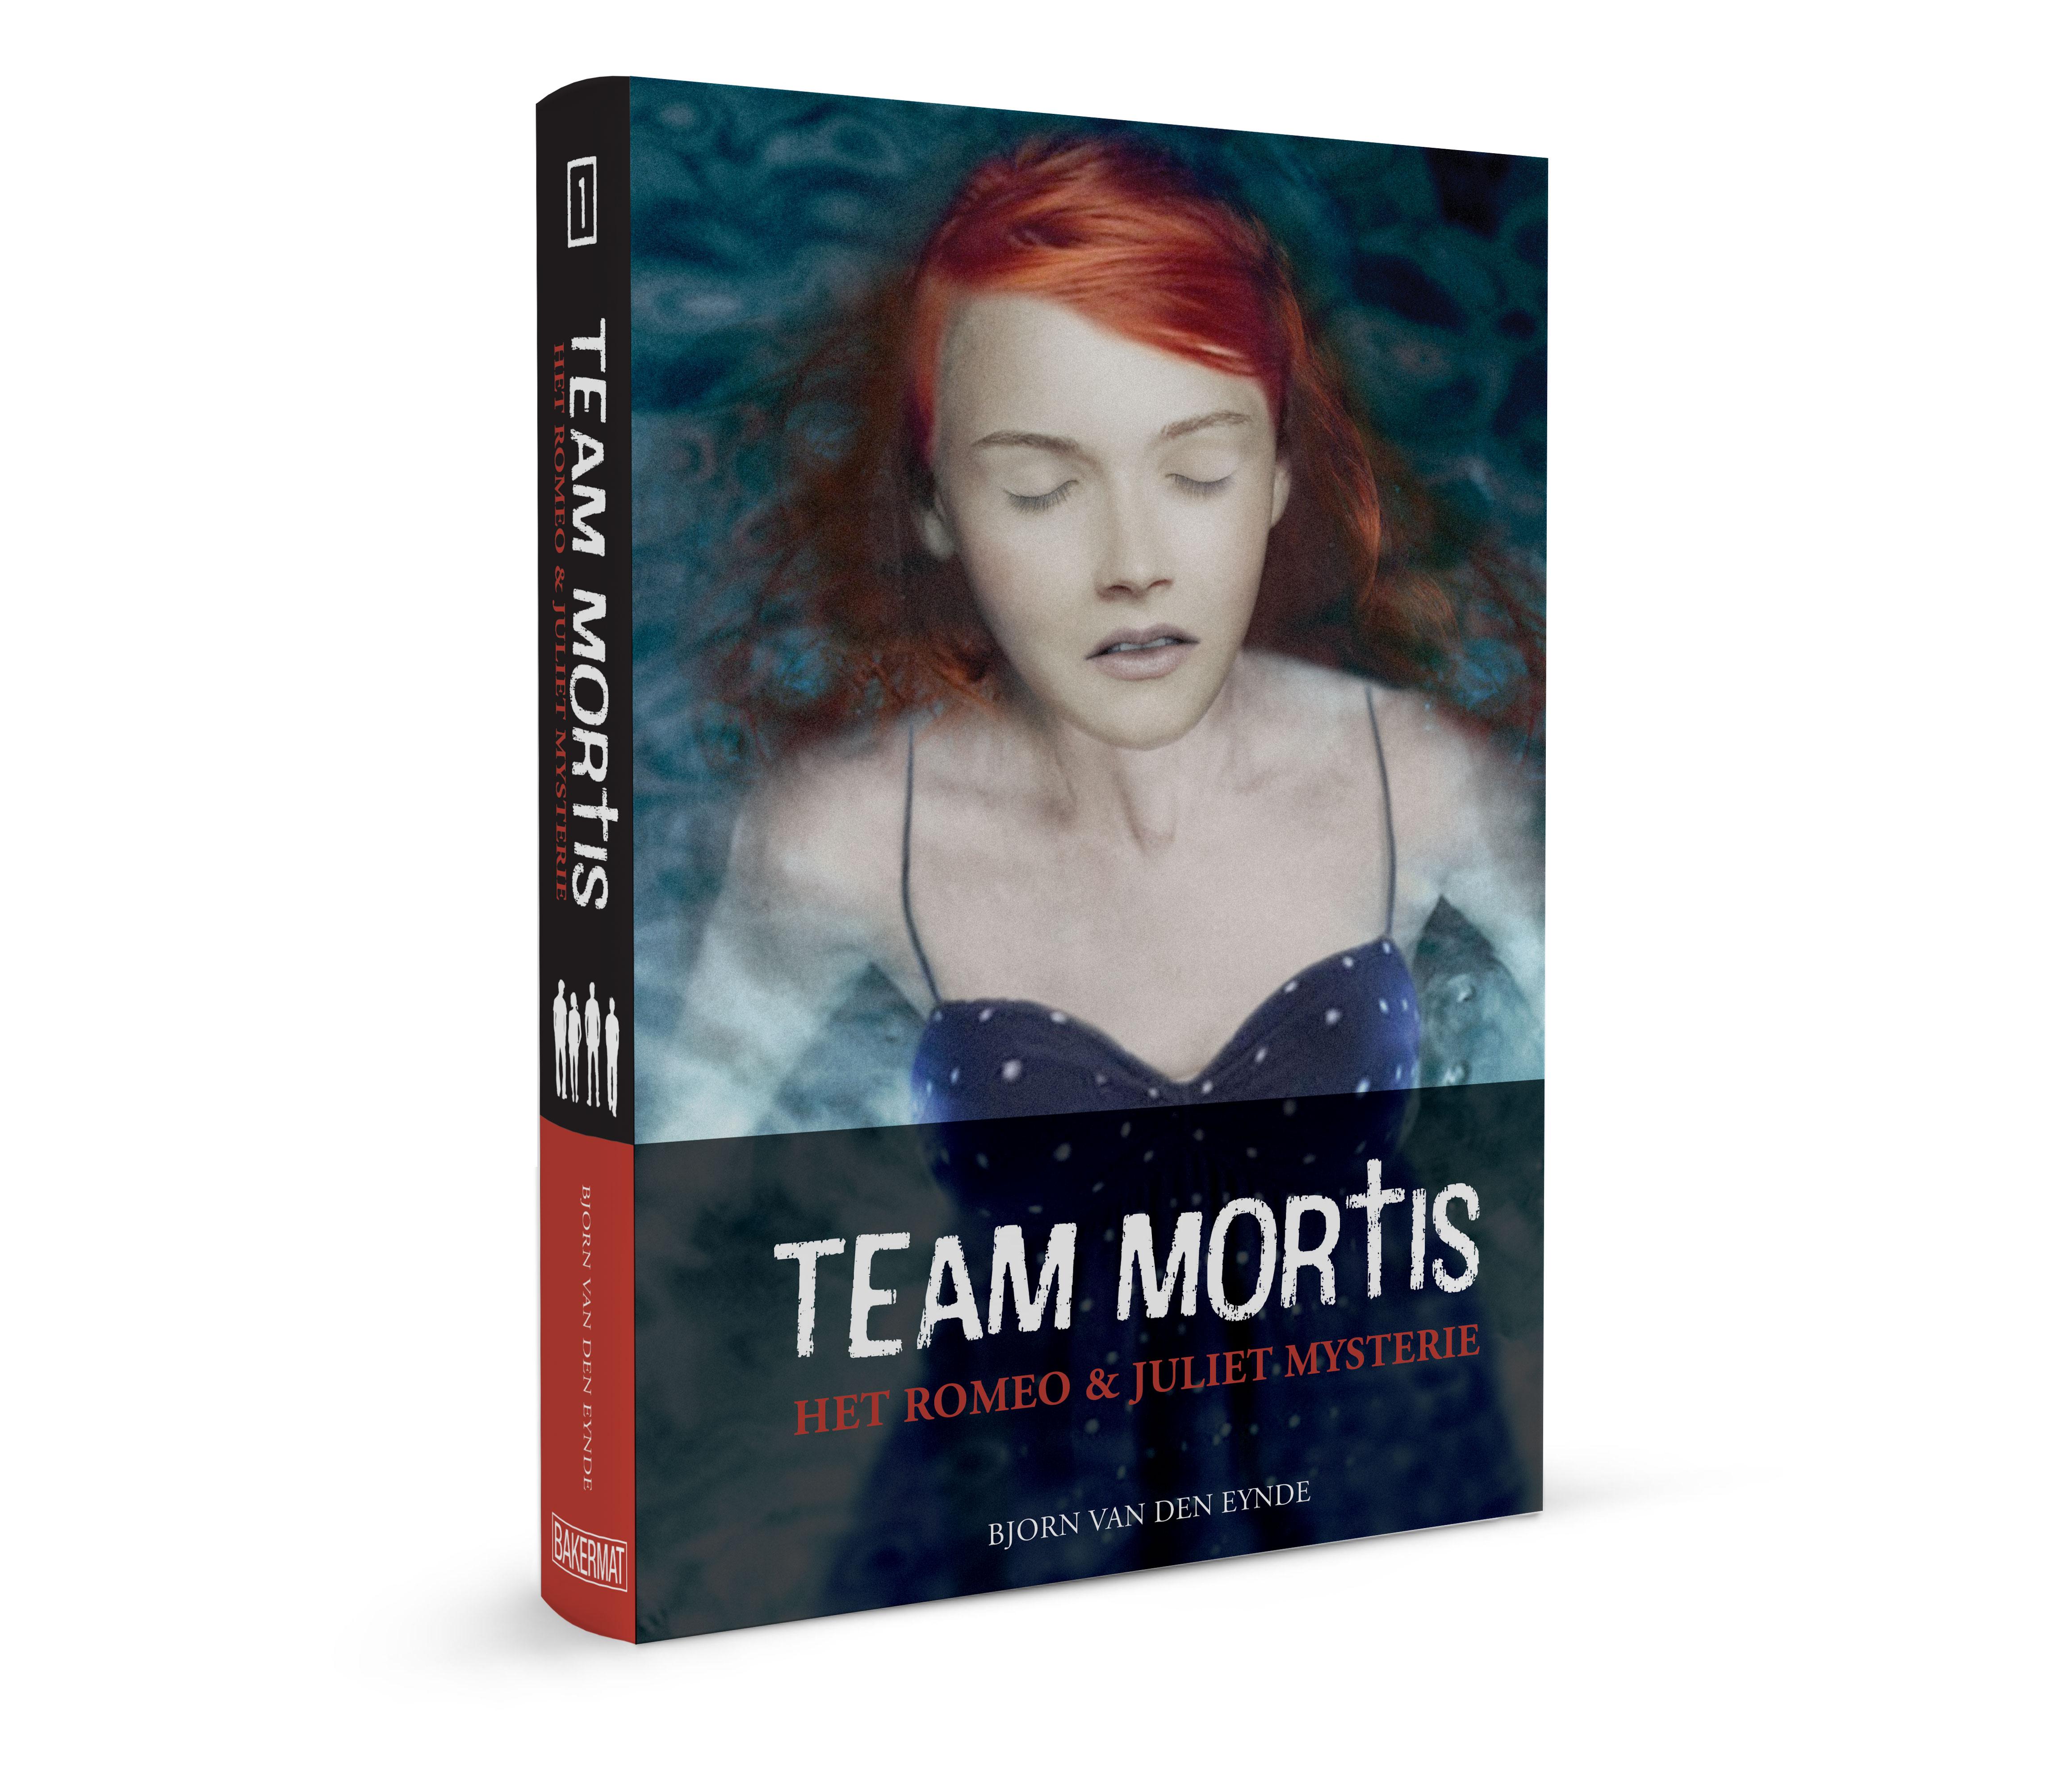 Team Mortis 1 3D cover